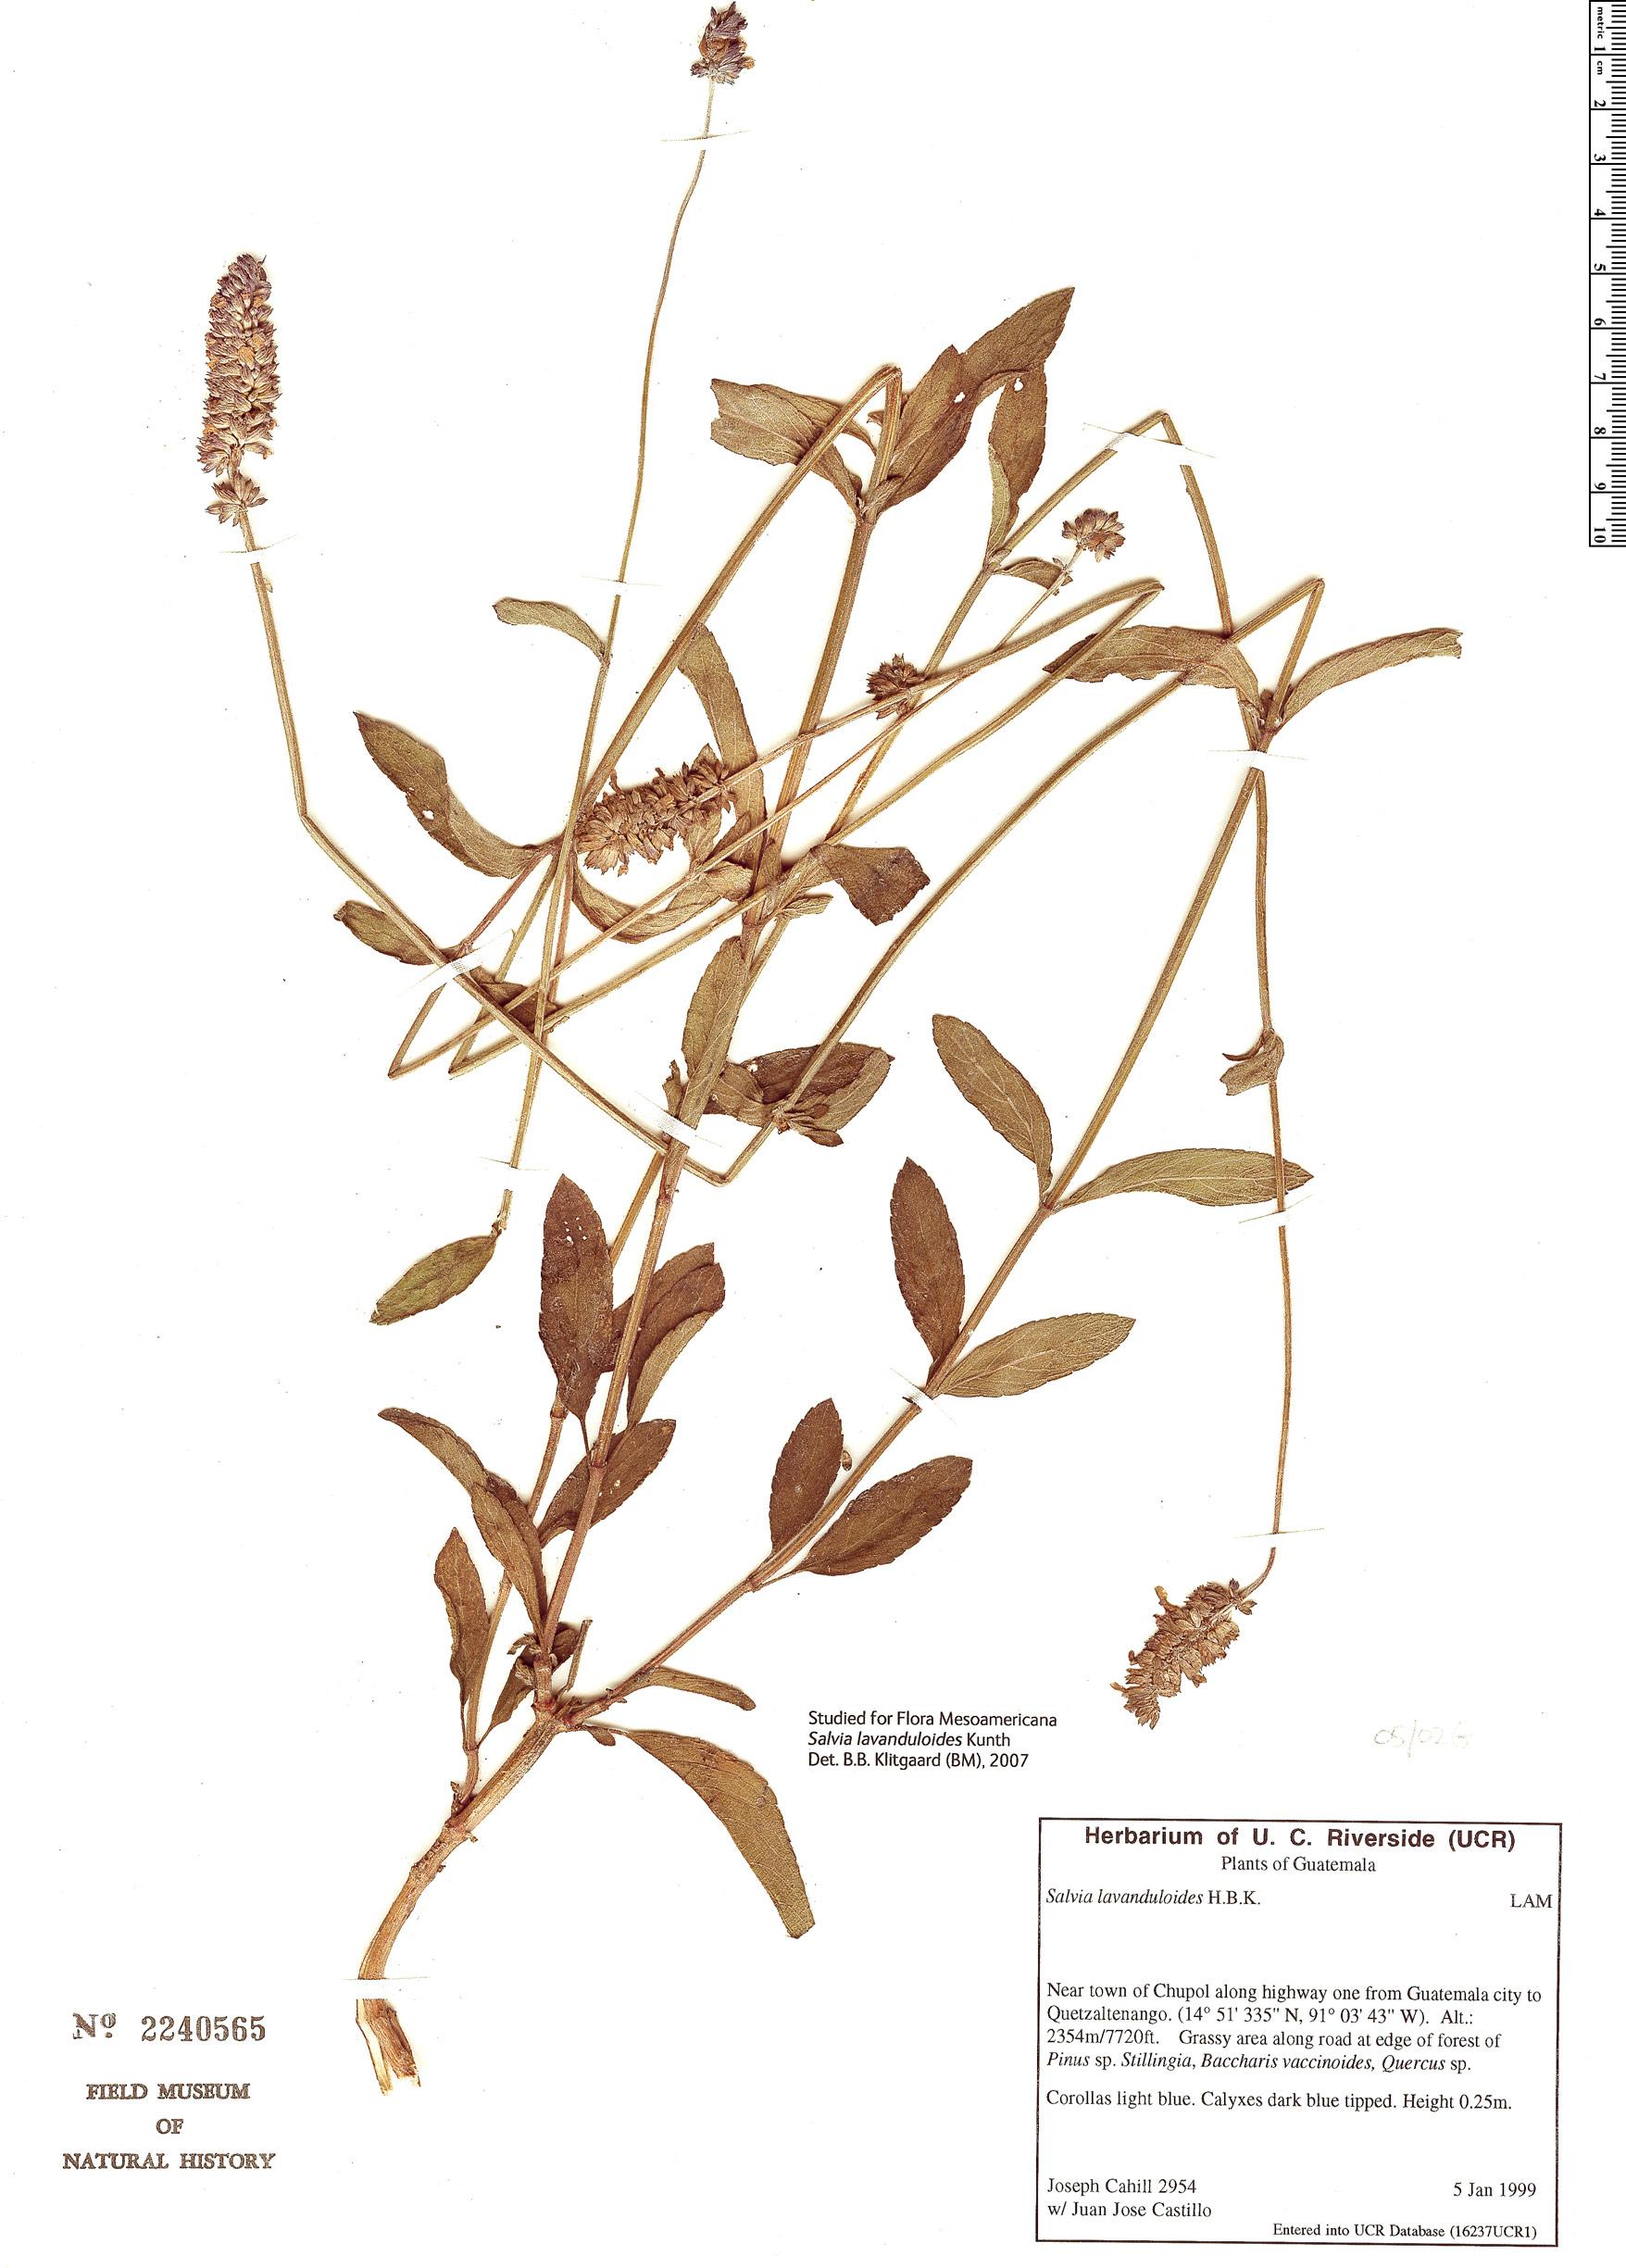 Specimen: Salvia lavanduloides